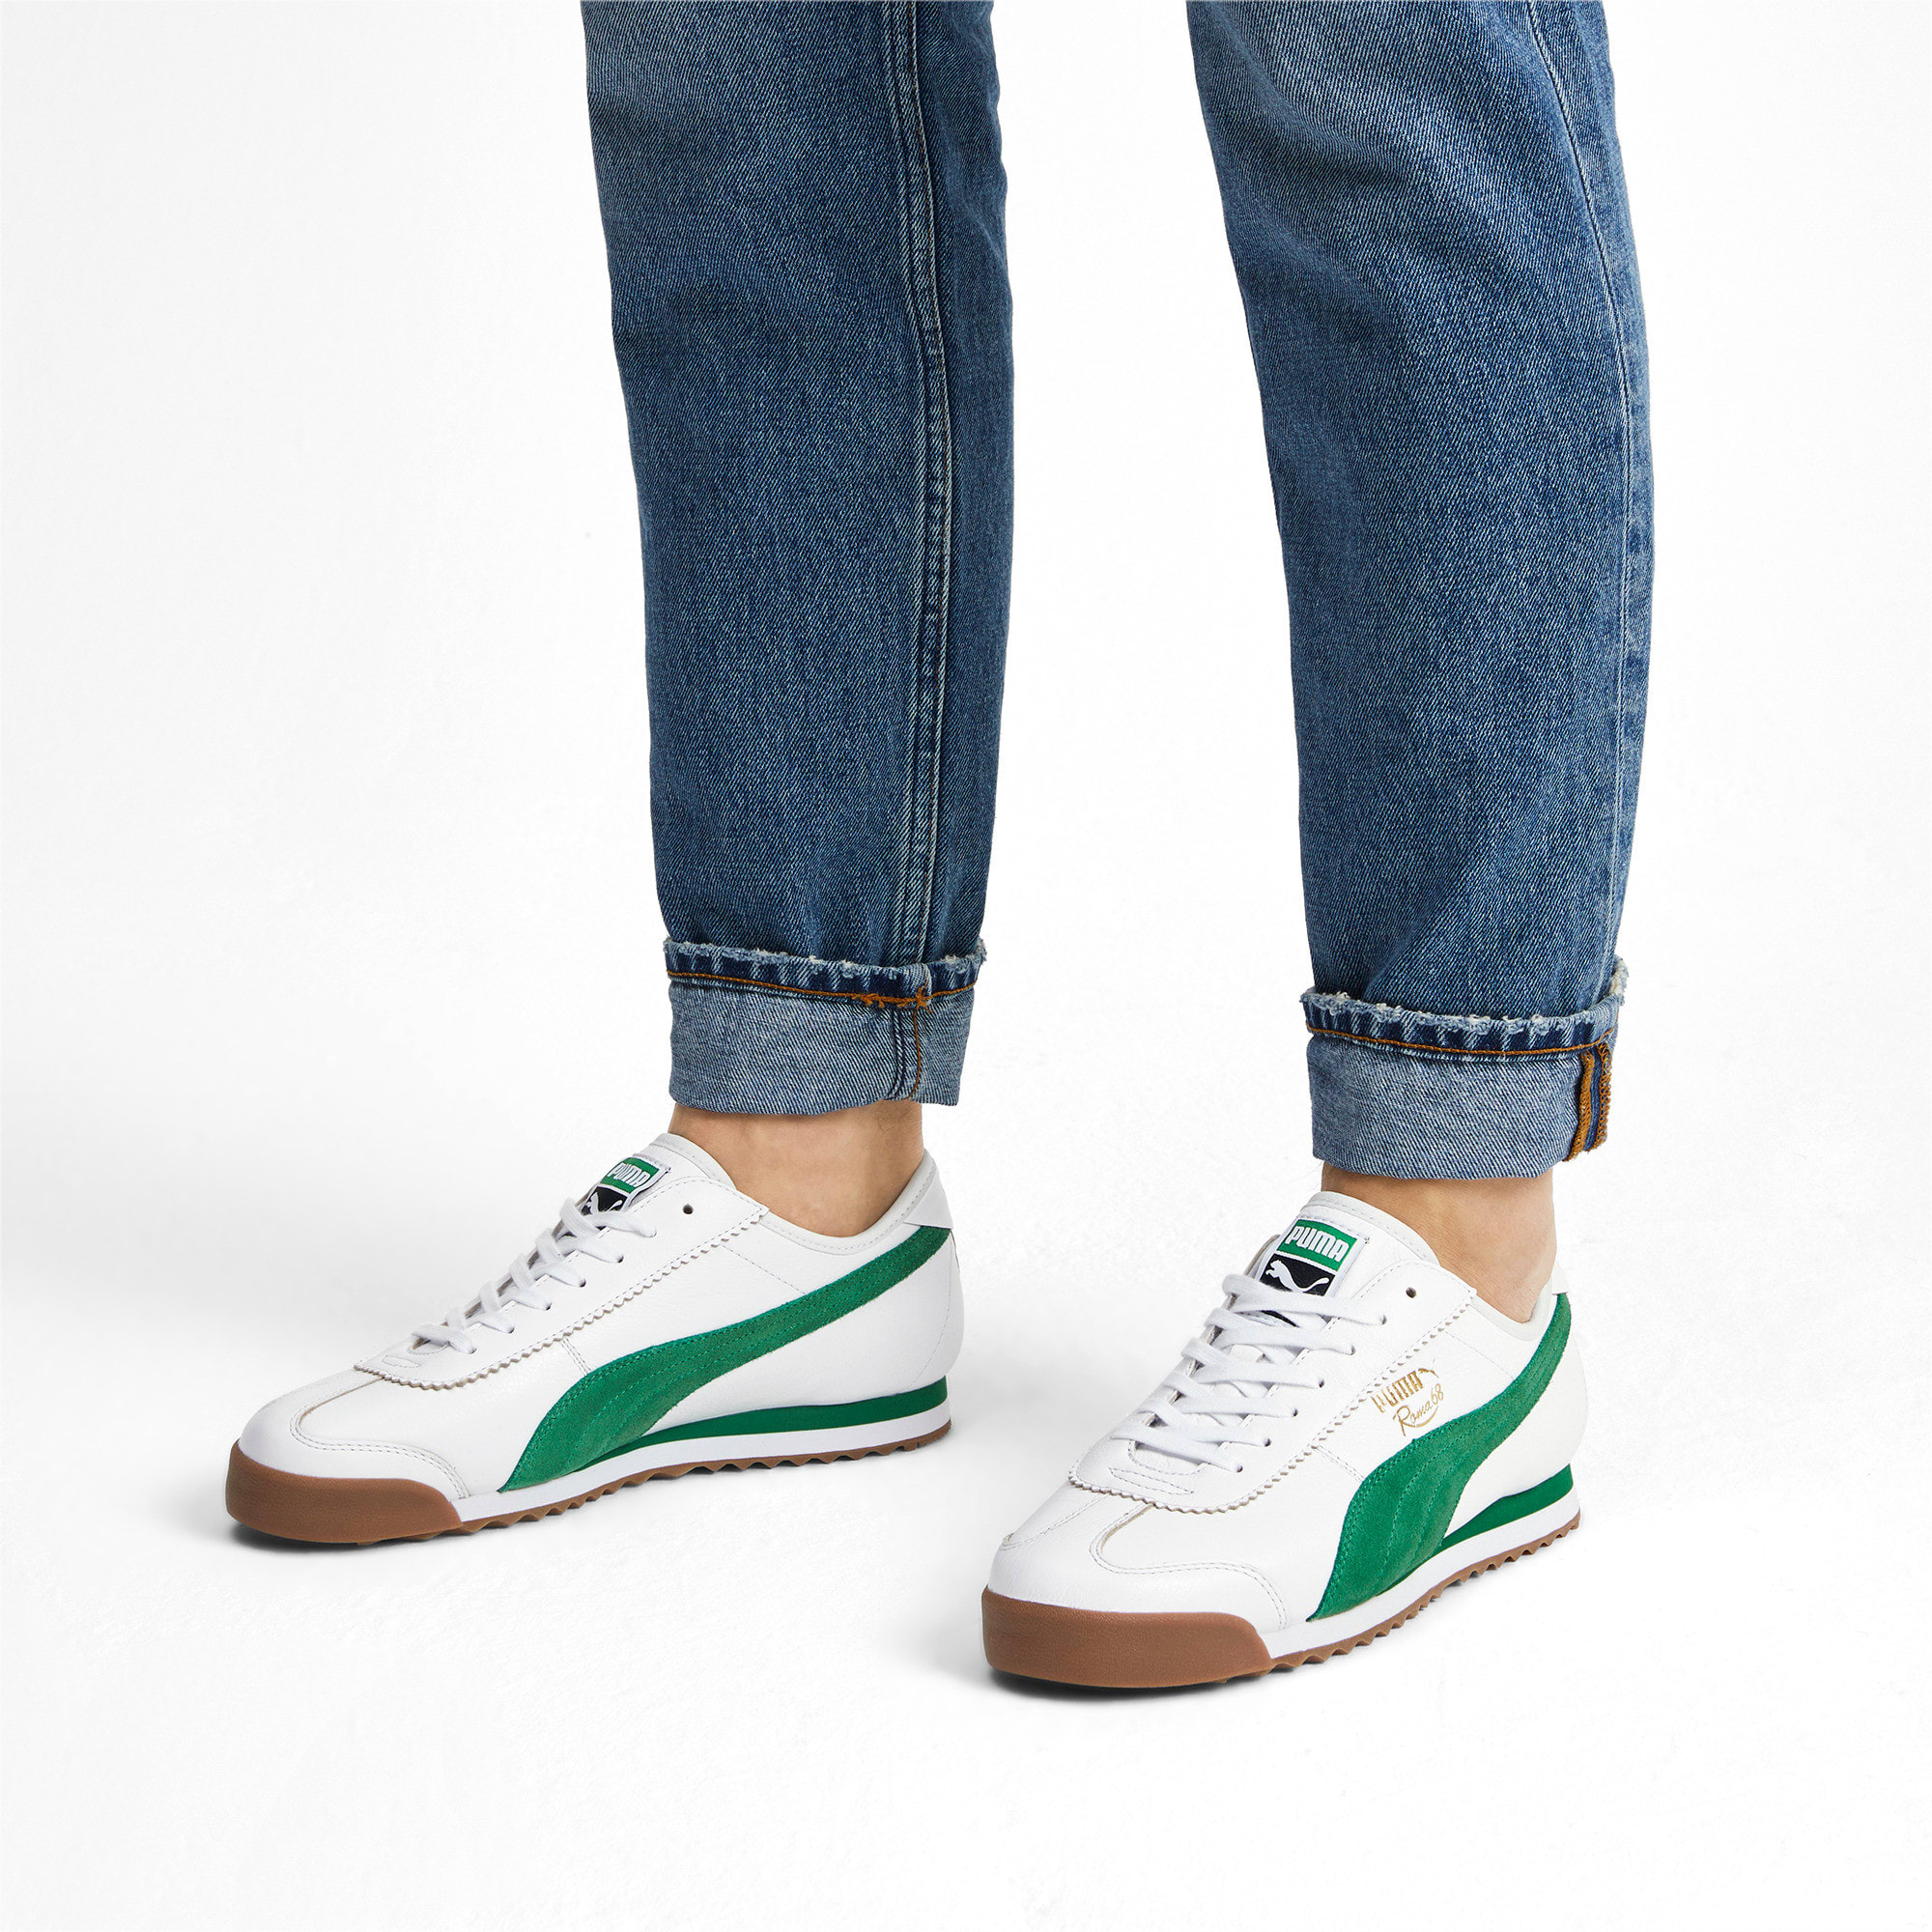 Thumbnail 2 of Roma '68 OG Sneakers, Puma White-Amazon Green, medium